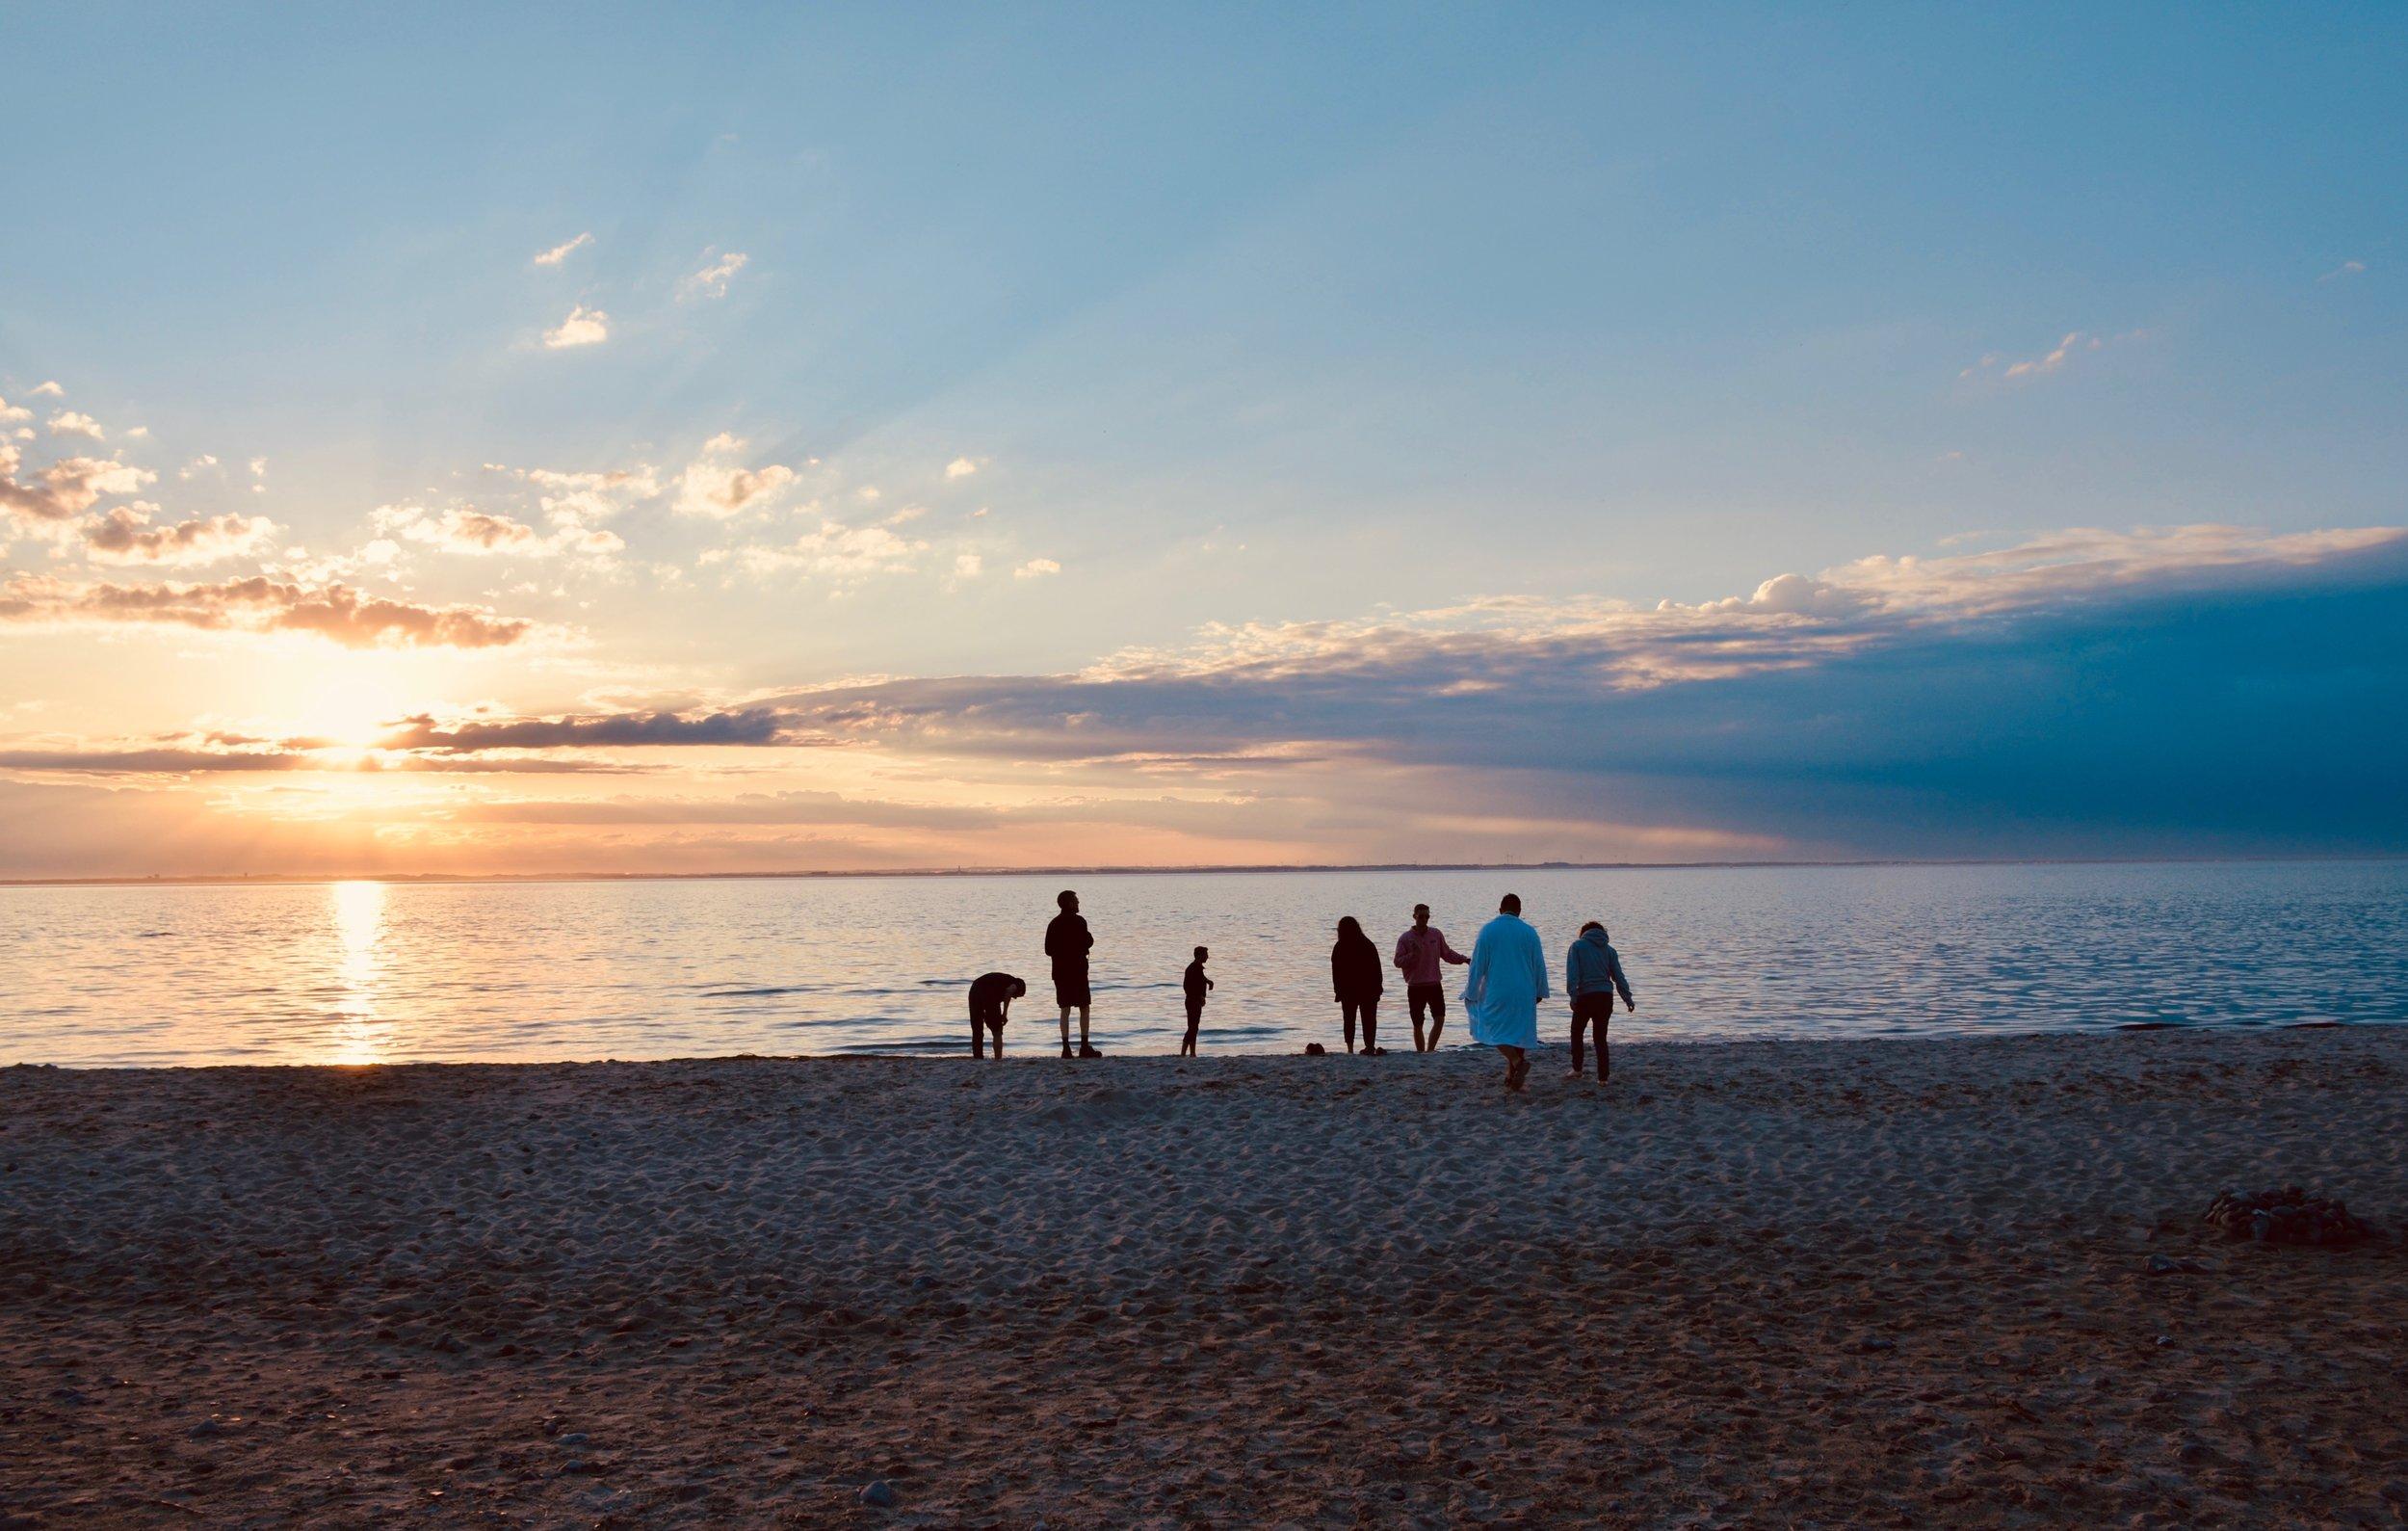 Members of Boston Organ Studio enjoy an evening along the Baltic Sea.